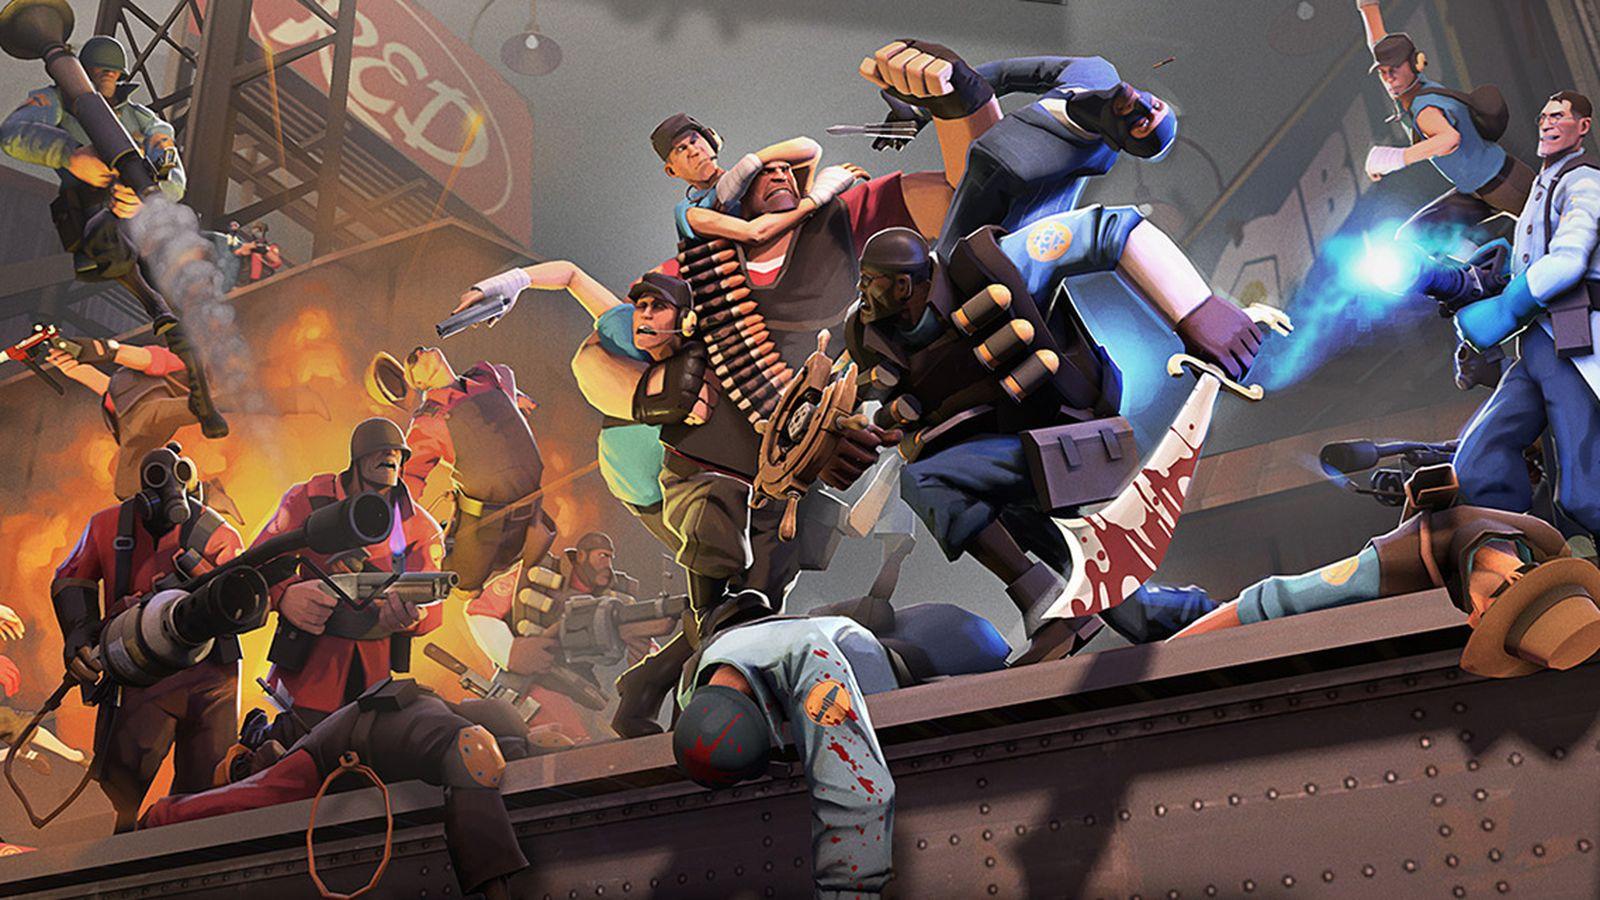 Обзор патча Jungle Inferno для Team Fortress 2